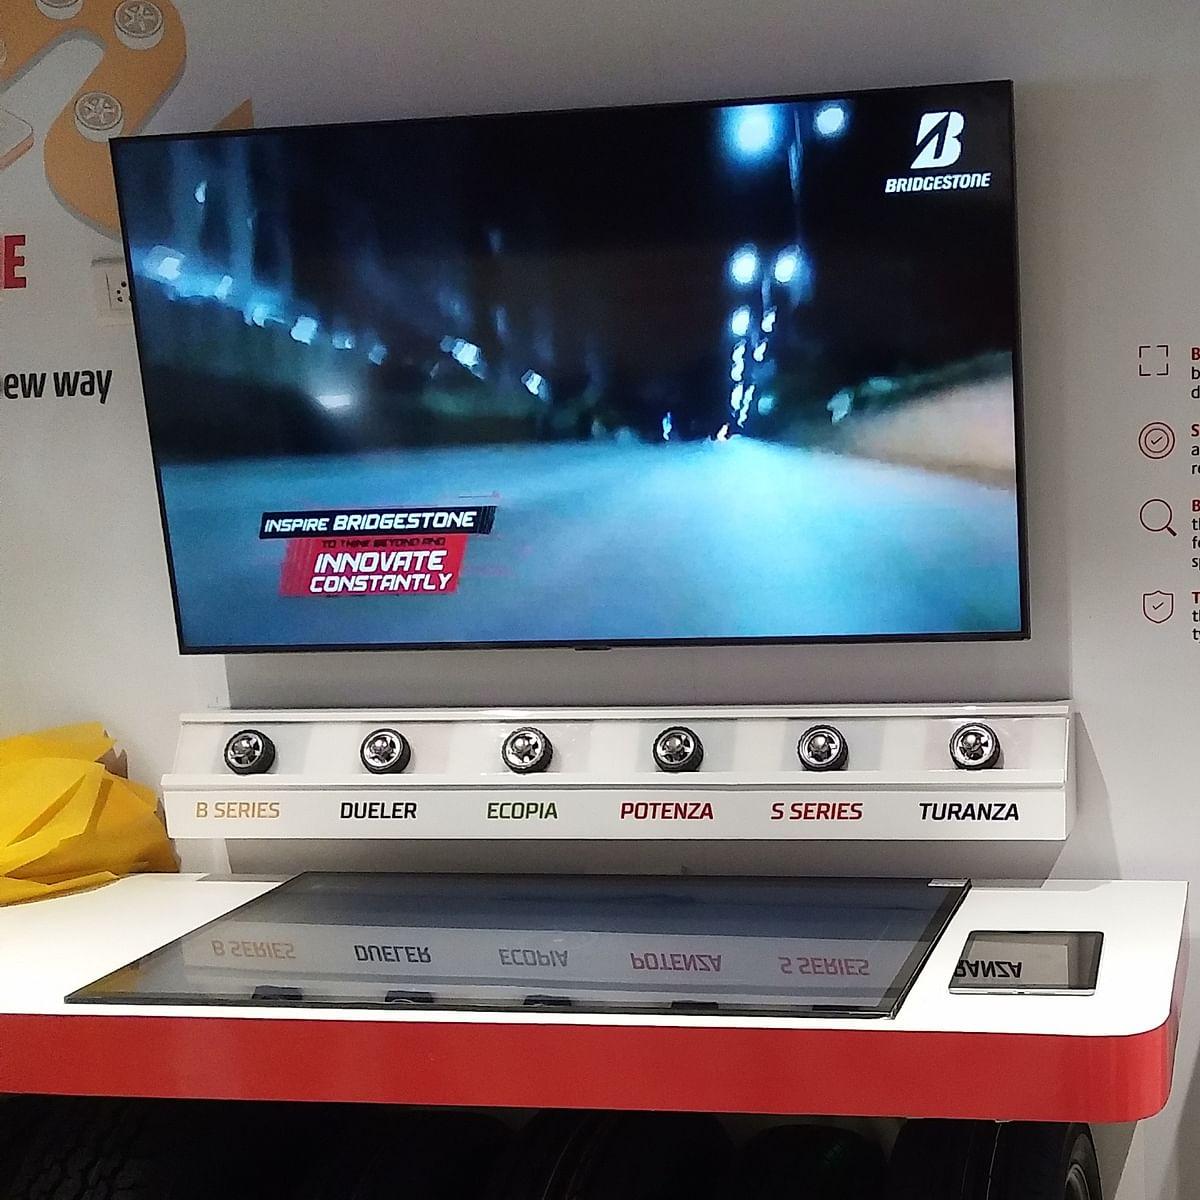 The digital tyre selection kiosk will be the hallmark of the Bridgestone select showroom